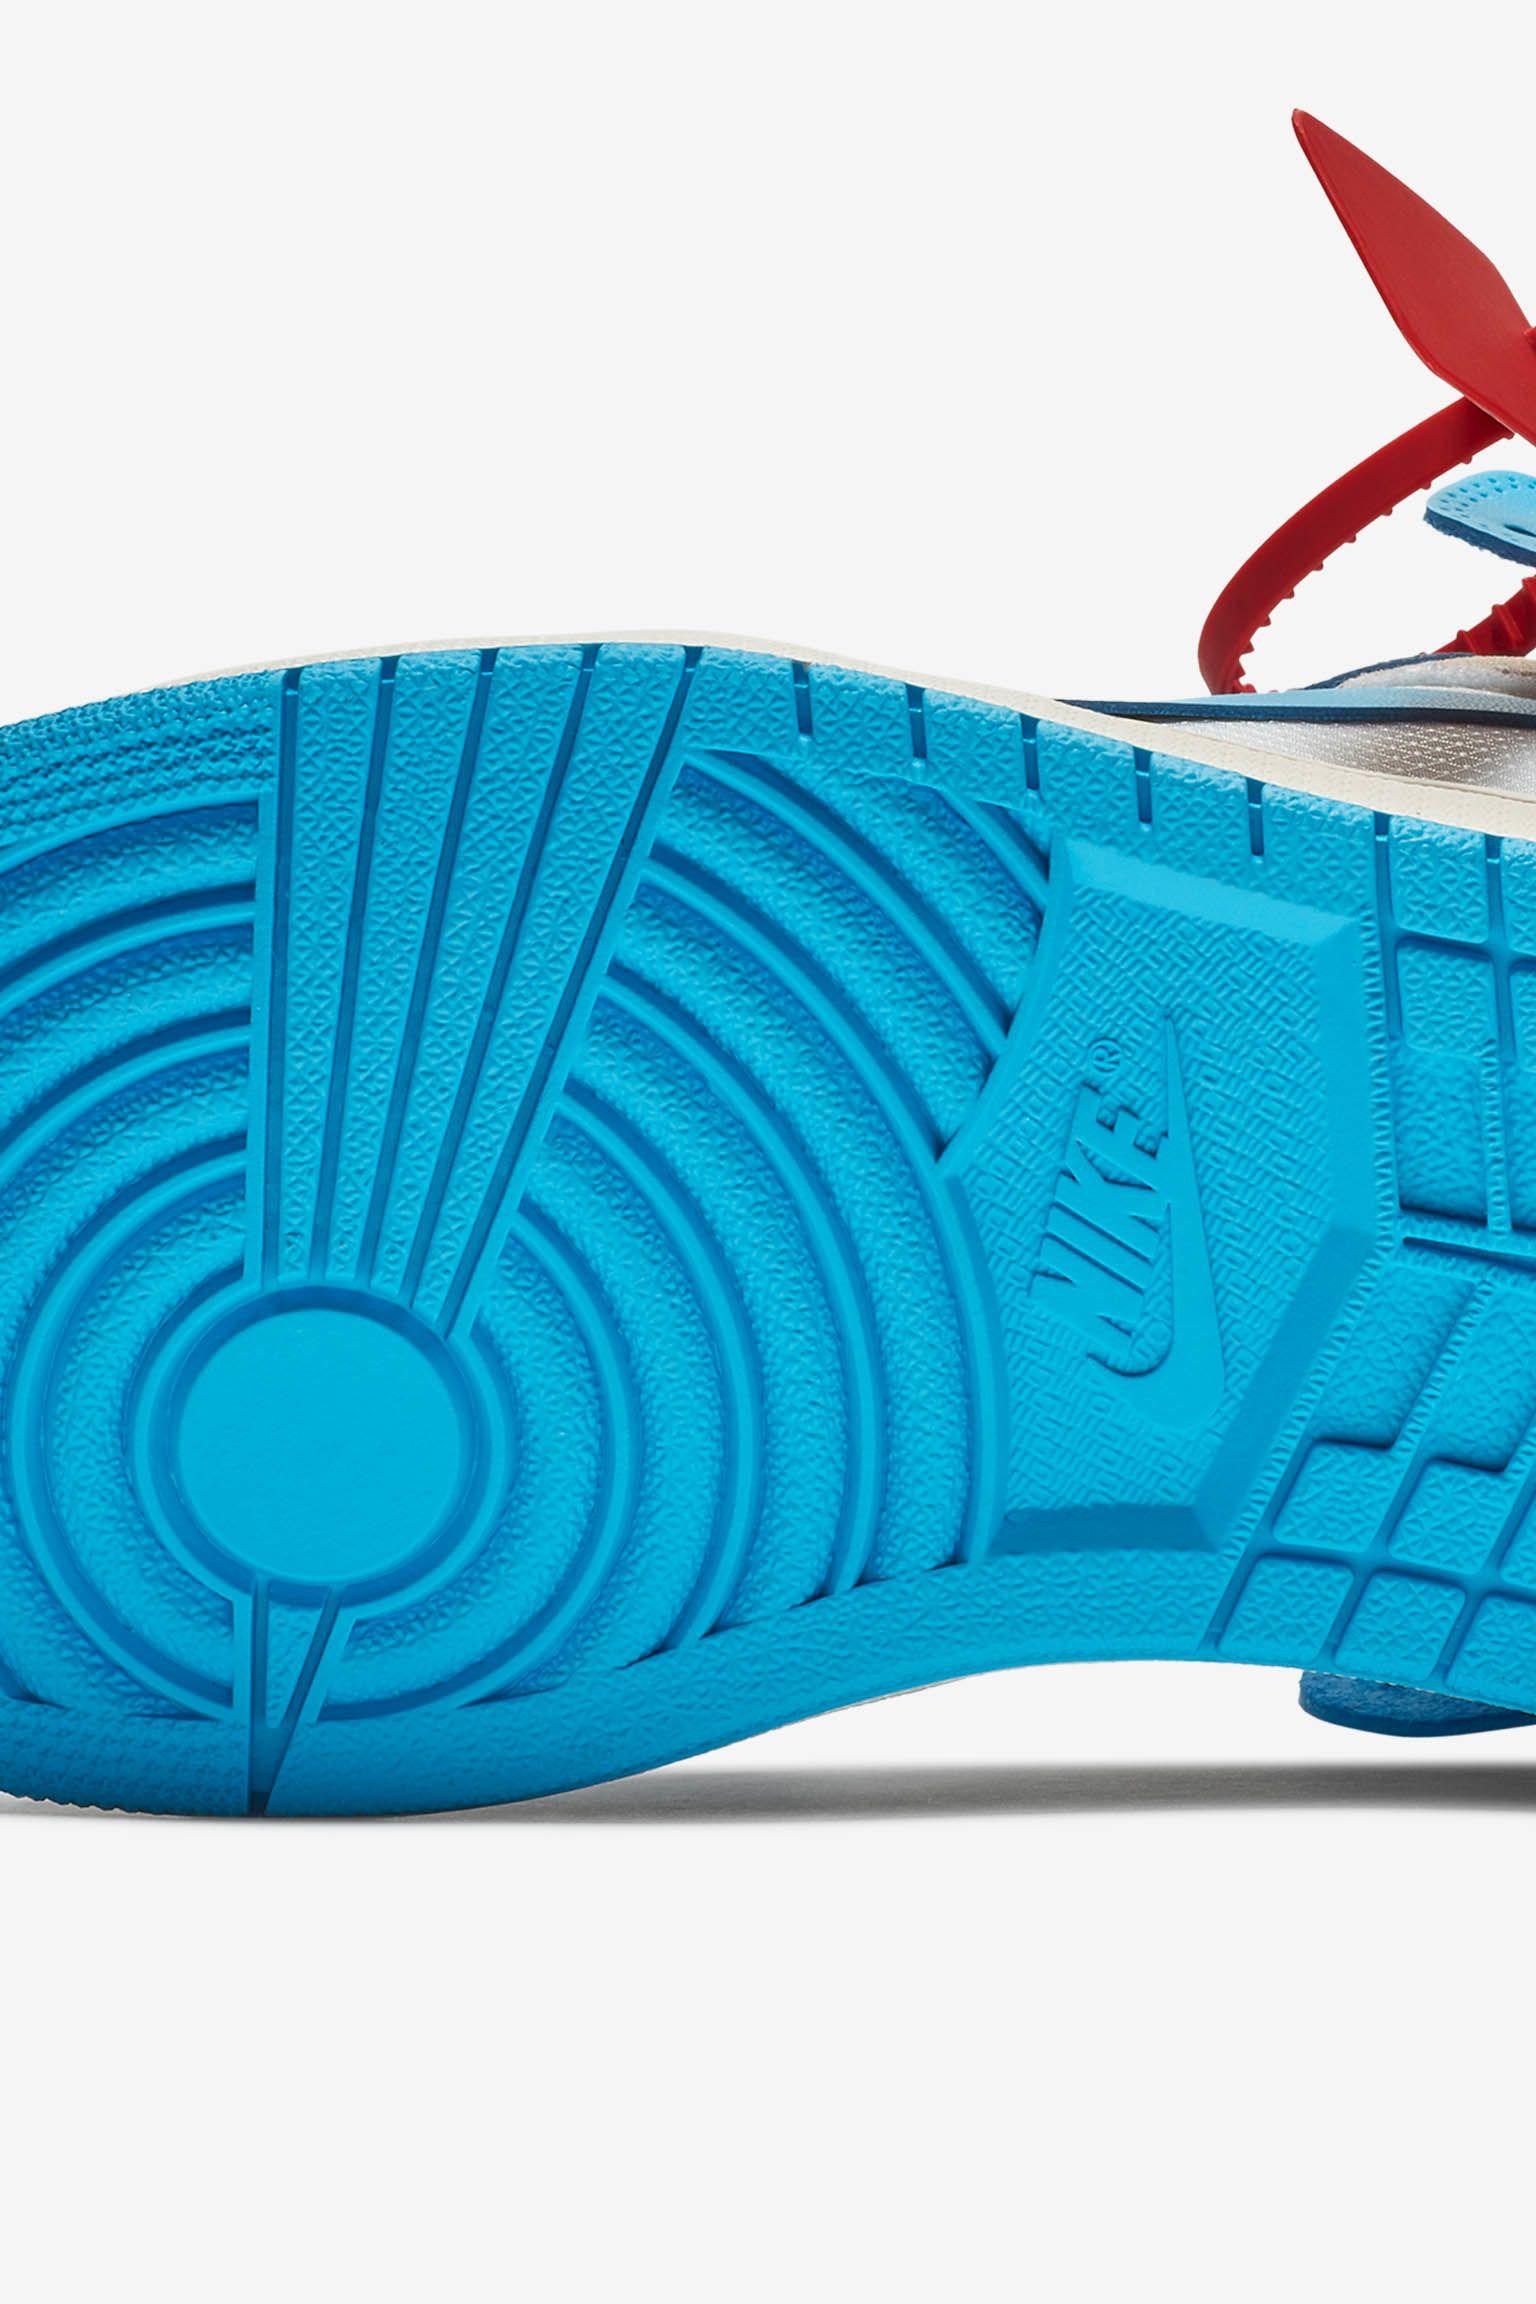 The Ten: Air Jordan 1 Off White 'Powder Blue' Release Date